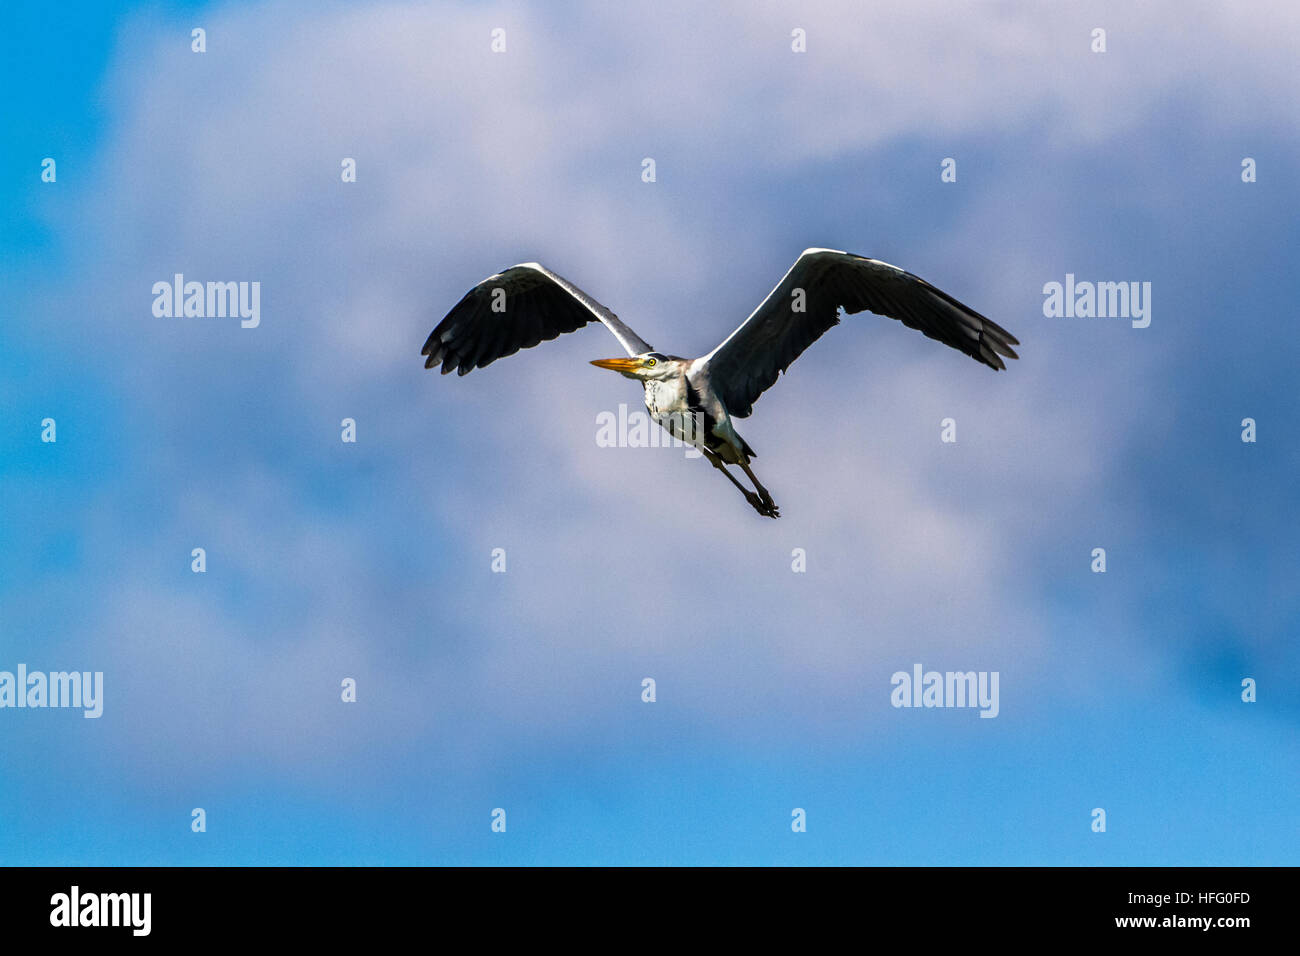 Grey heron flying isolated in blue sky ; specie Ardea cinerea  family of ardeidae - Stock Image